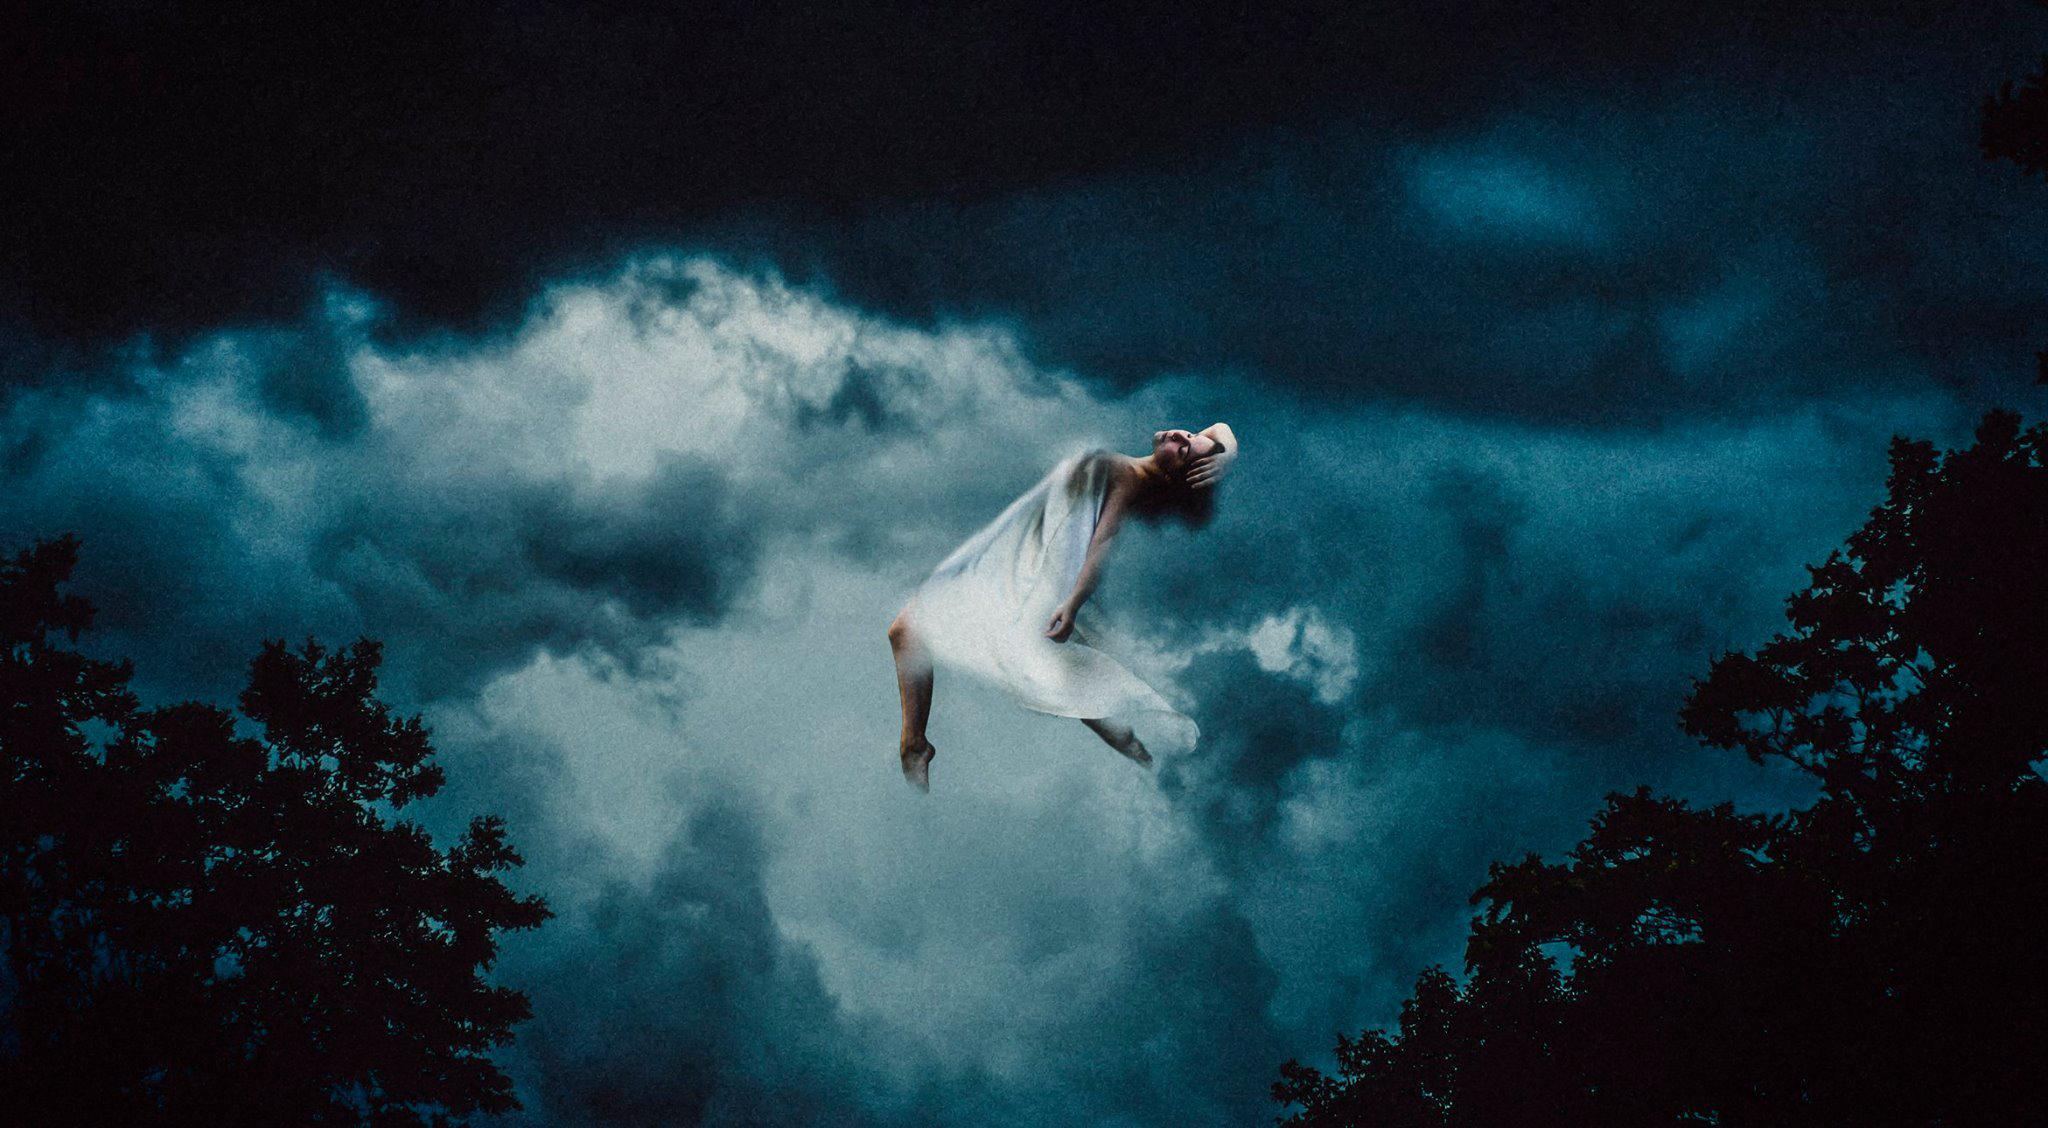 Gabrielle Van Wyck White Sails Creative Self Portraits Personal Work Fine Art Photography.JPG